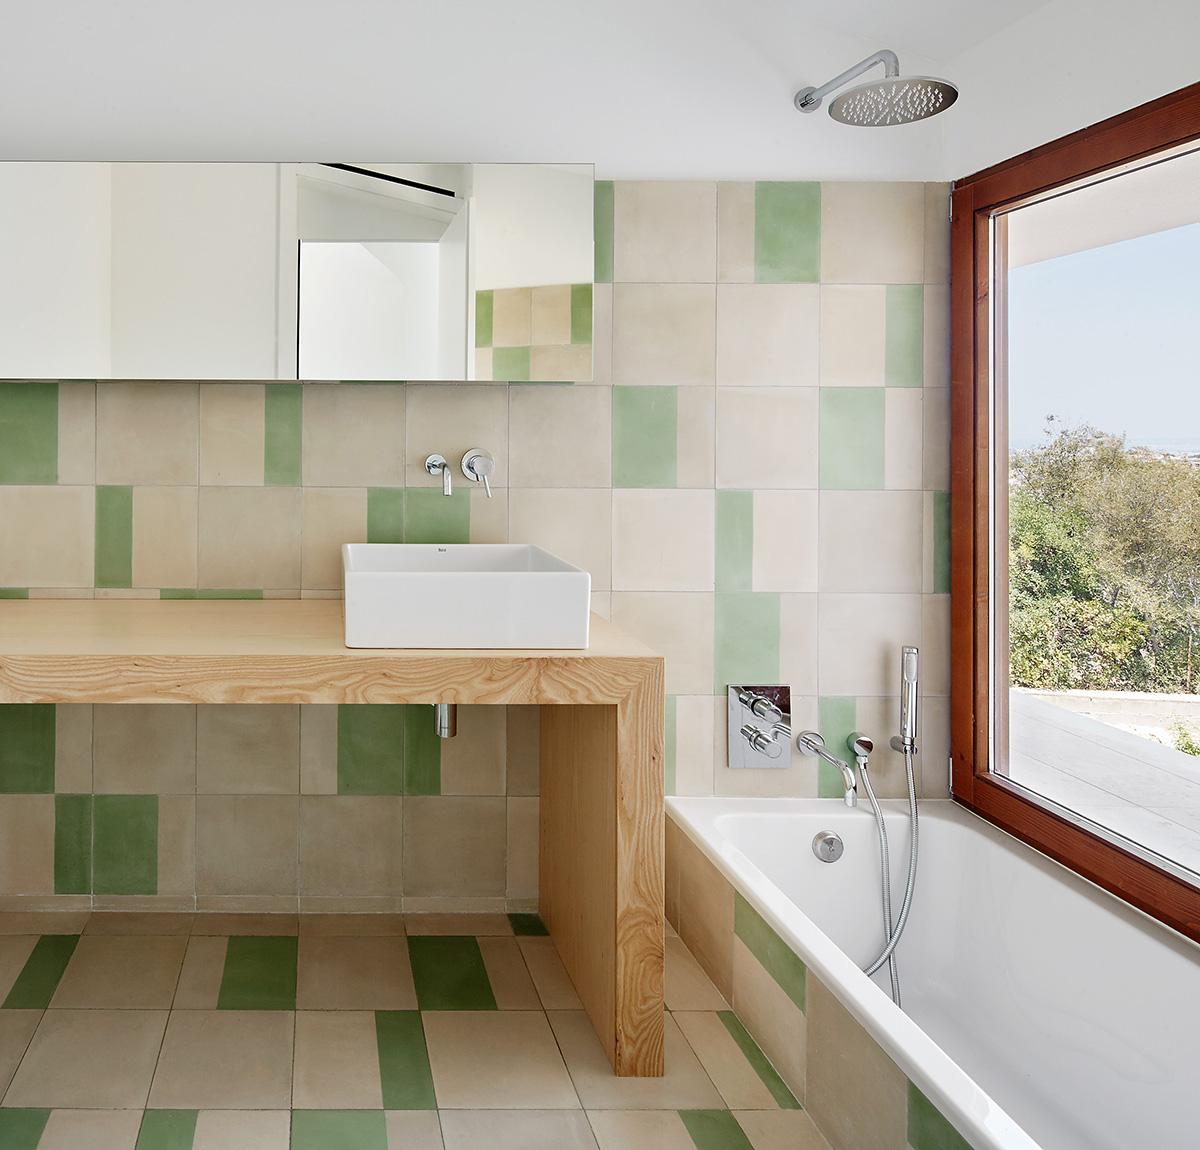 14-casa-mm-ohlab-oliver-hernaiz-architecture-lab-foto-jose-hevia